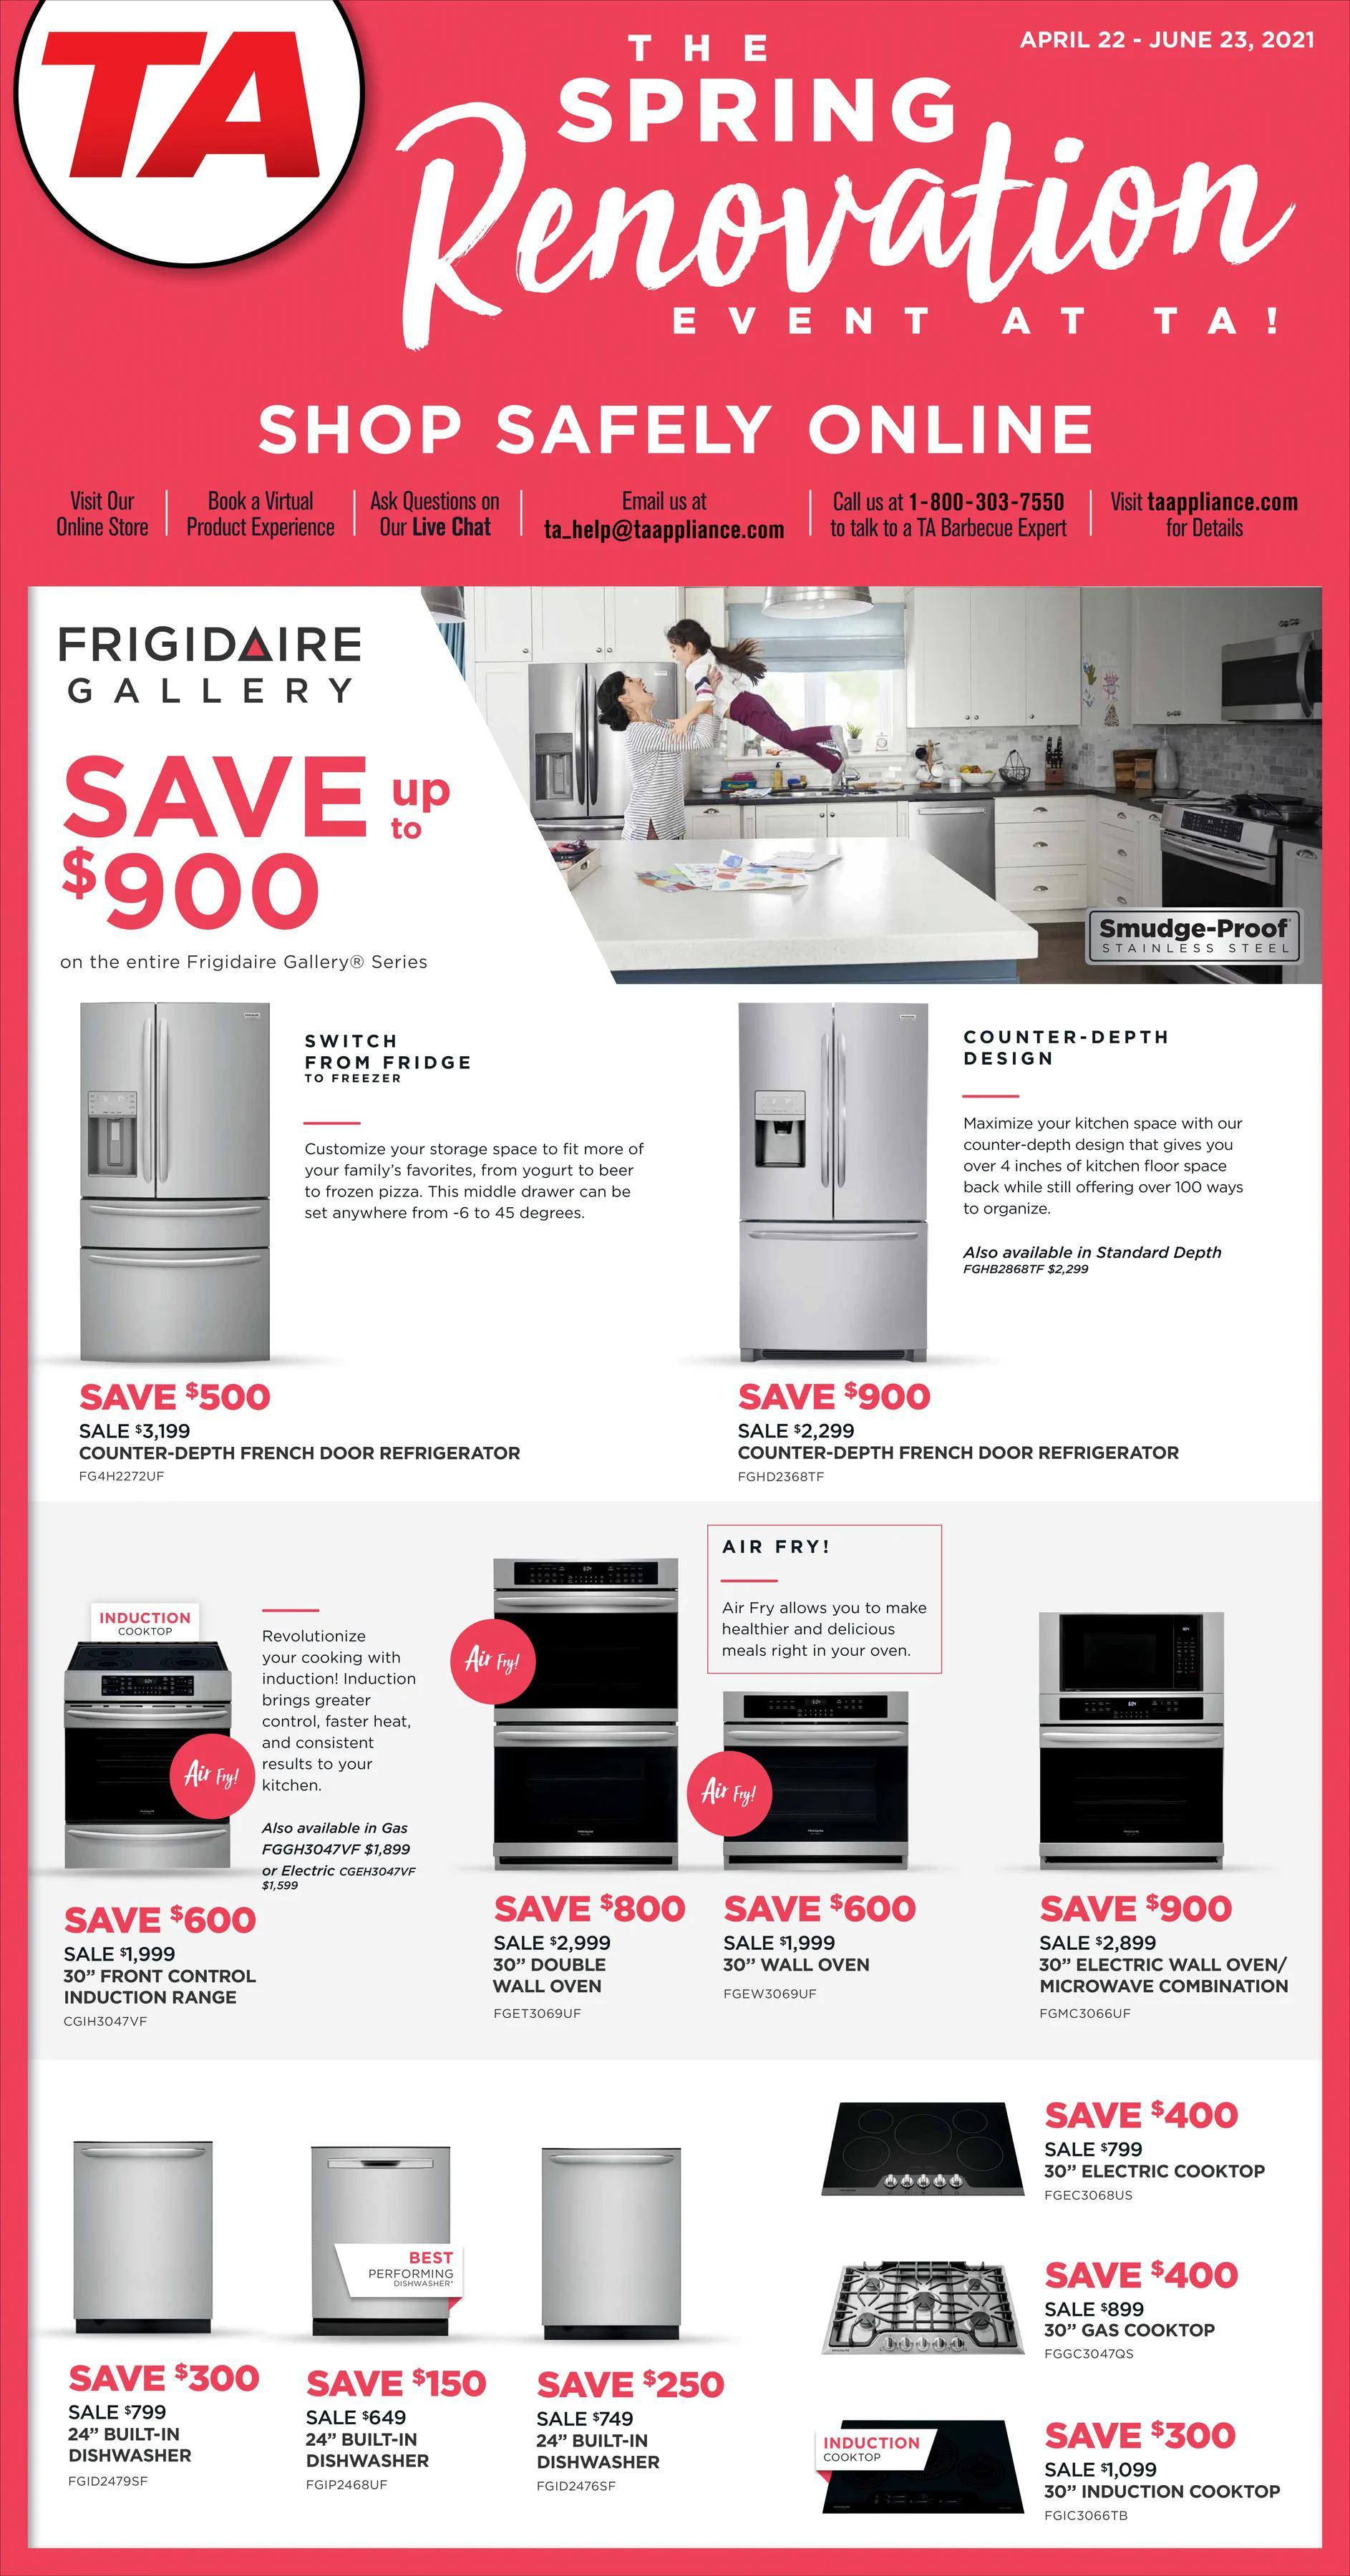 TA Appliance - The Spring Renovation